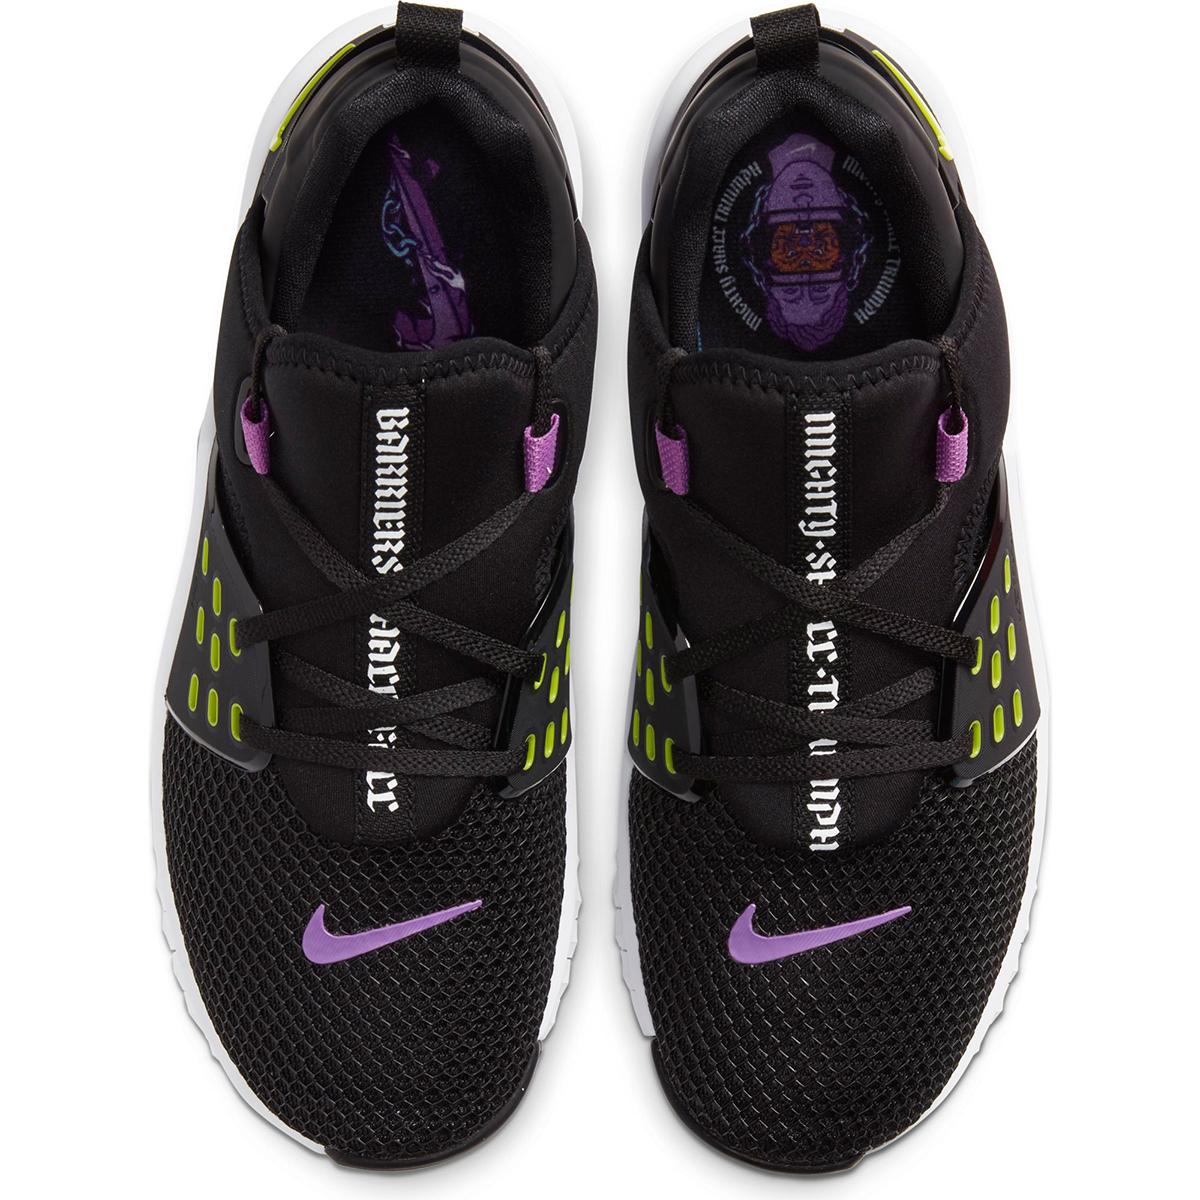 Men's Nike Free X Metcon 2 Training Shoes - Color: Black/Purple Nebula/White/Bright (Regular Width) - Size: 6, Black/Purple Nebula/White/Bright, large, image 3